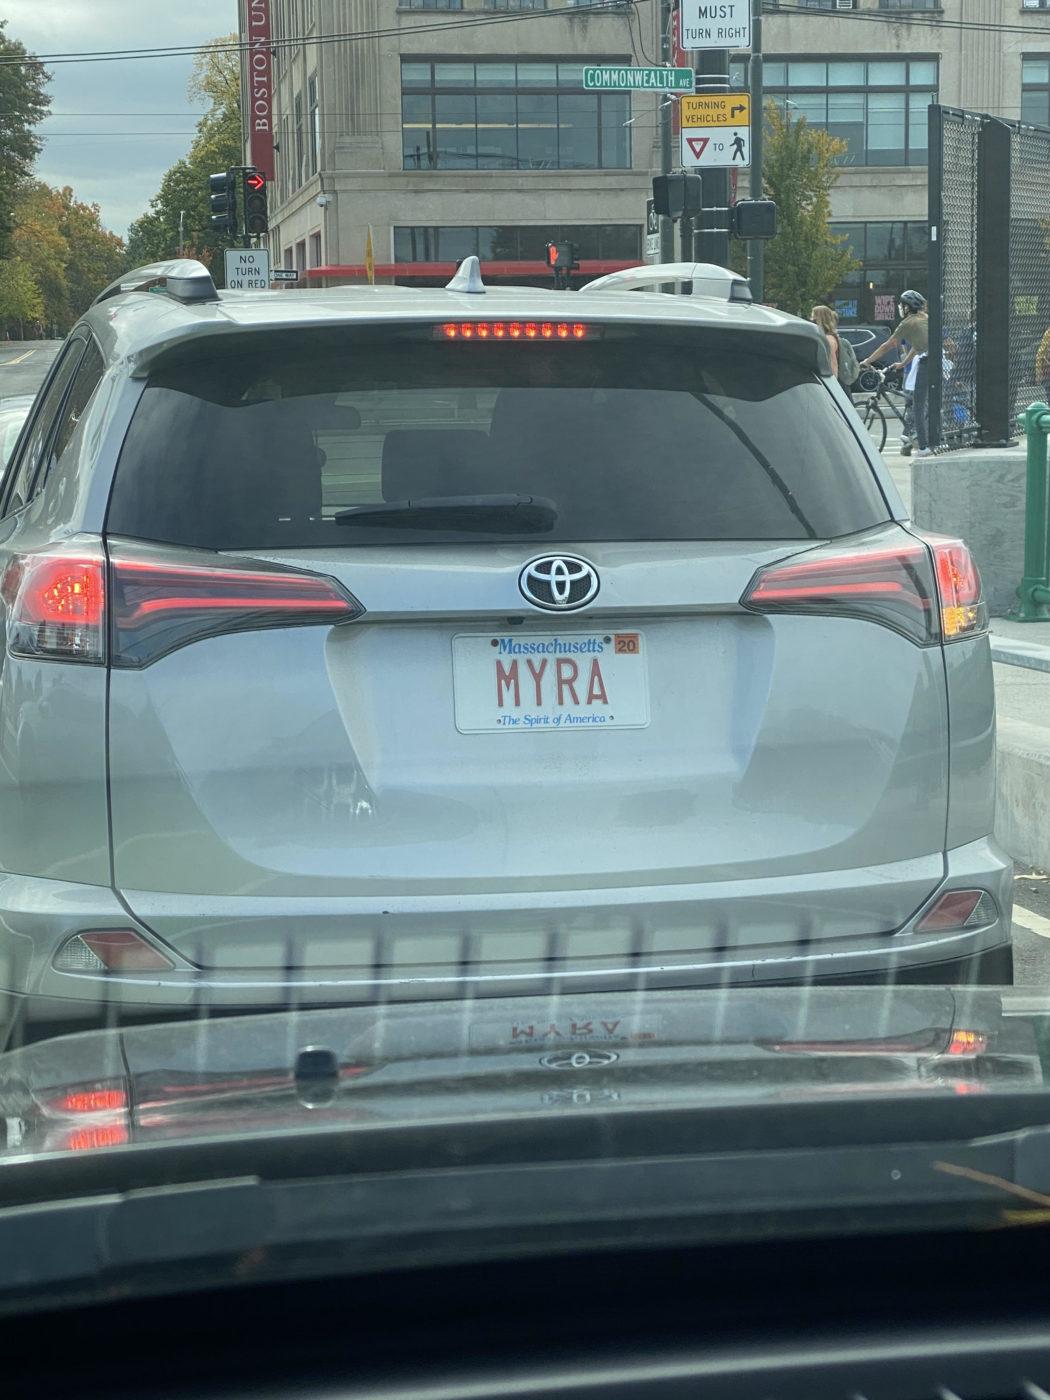 Myra Plate